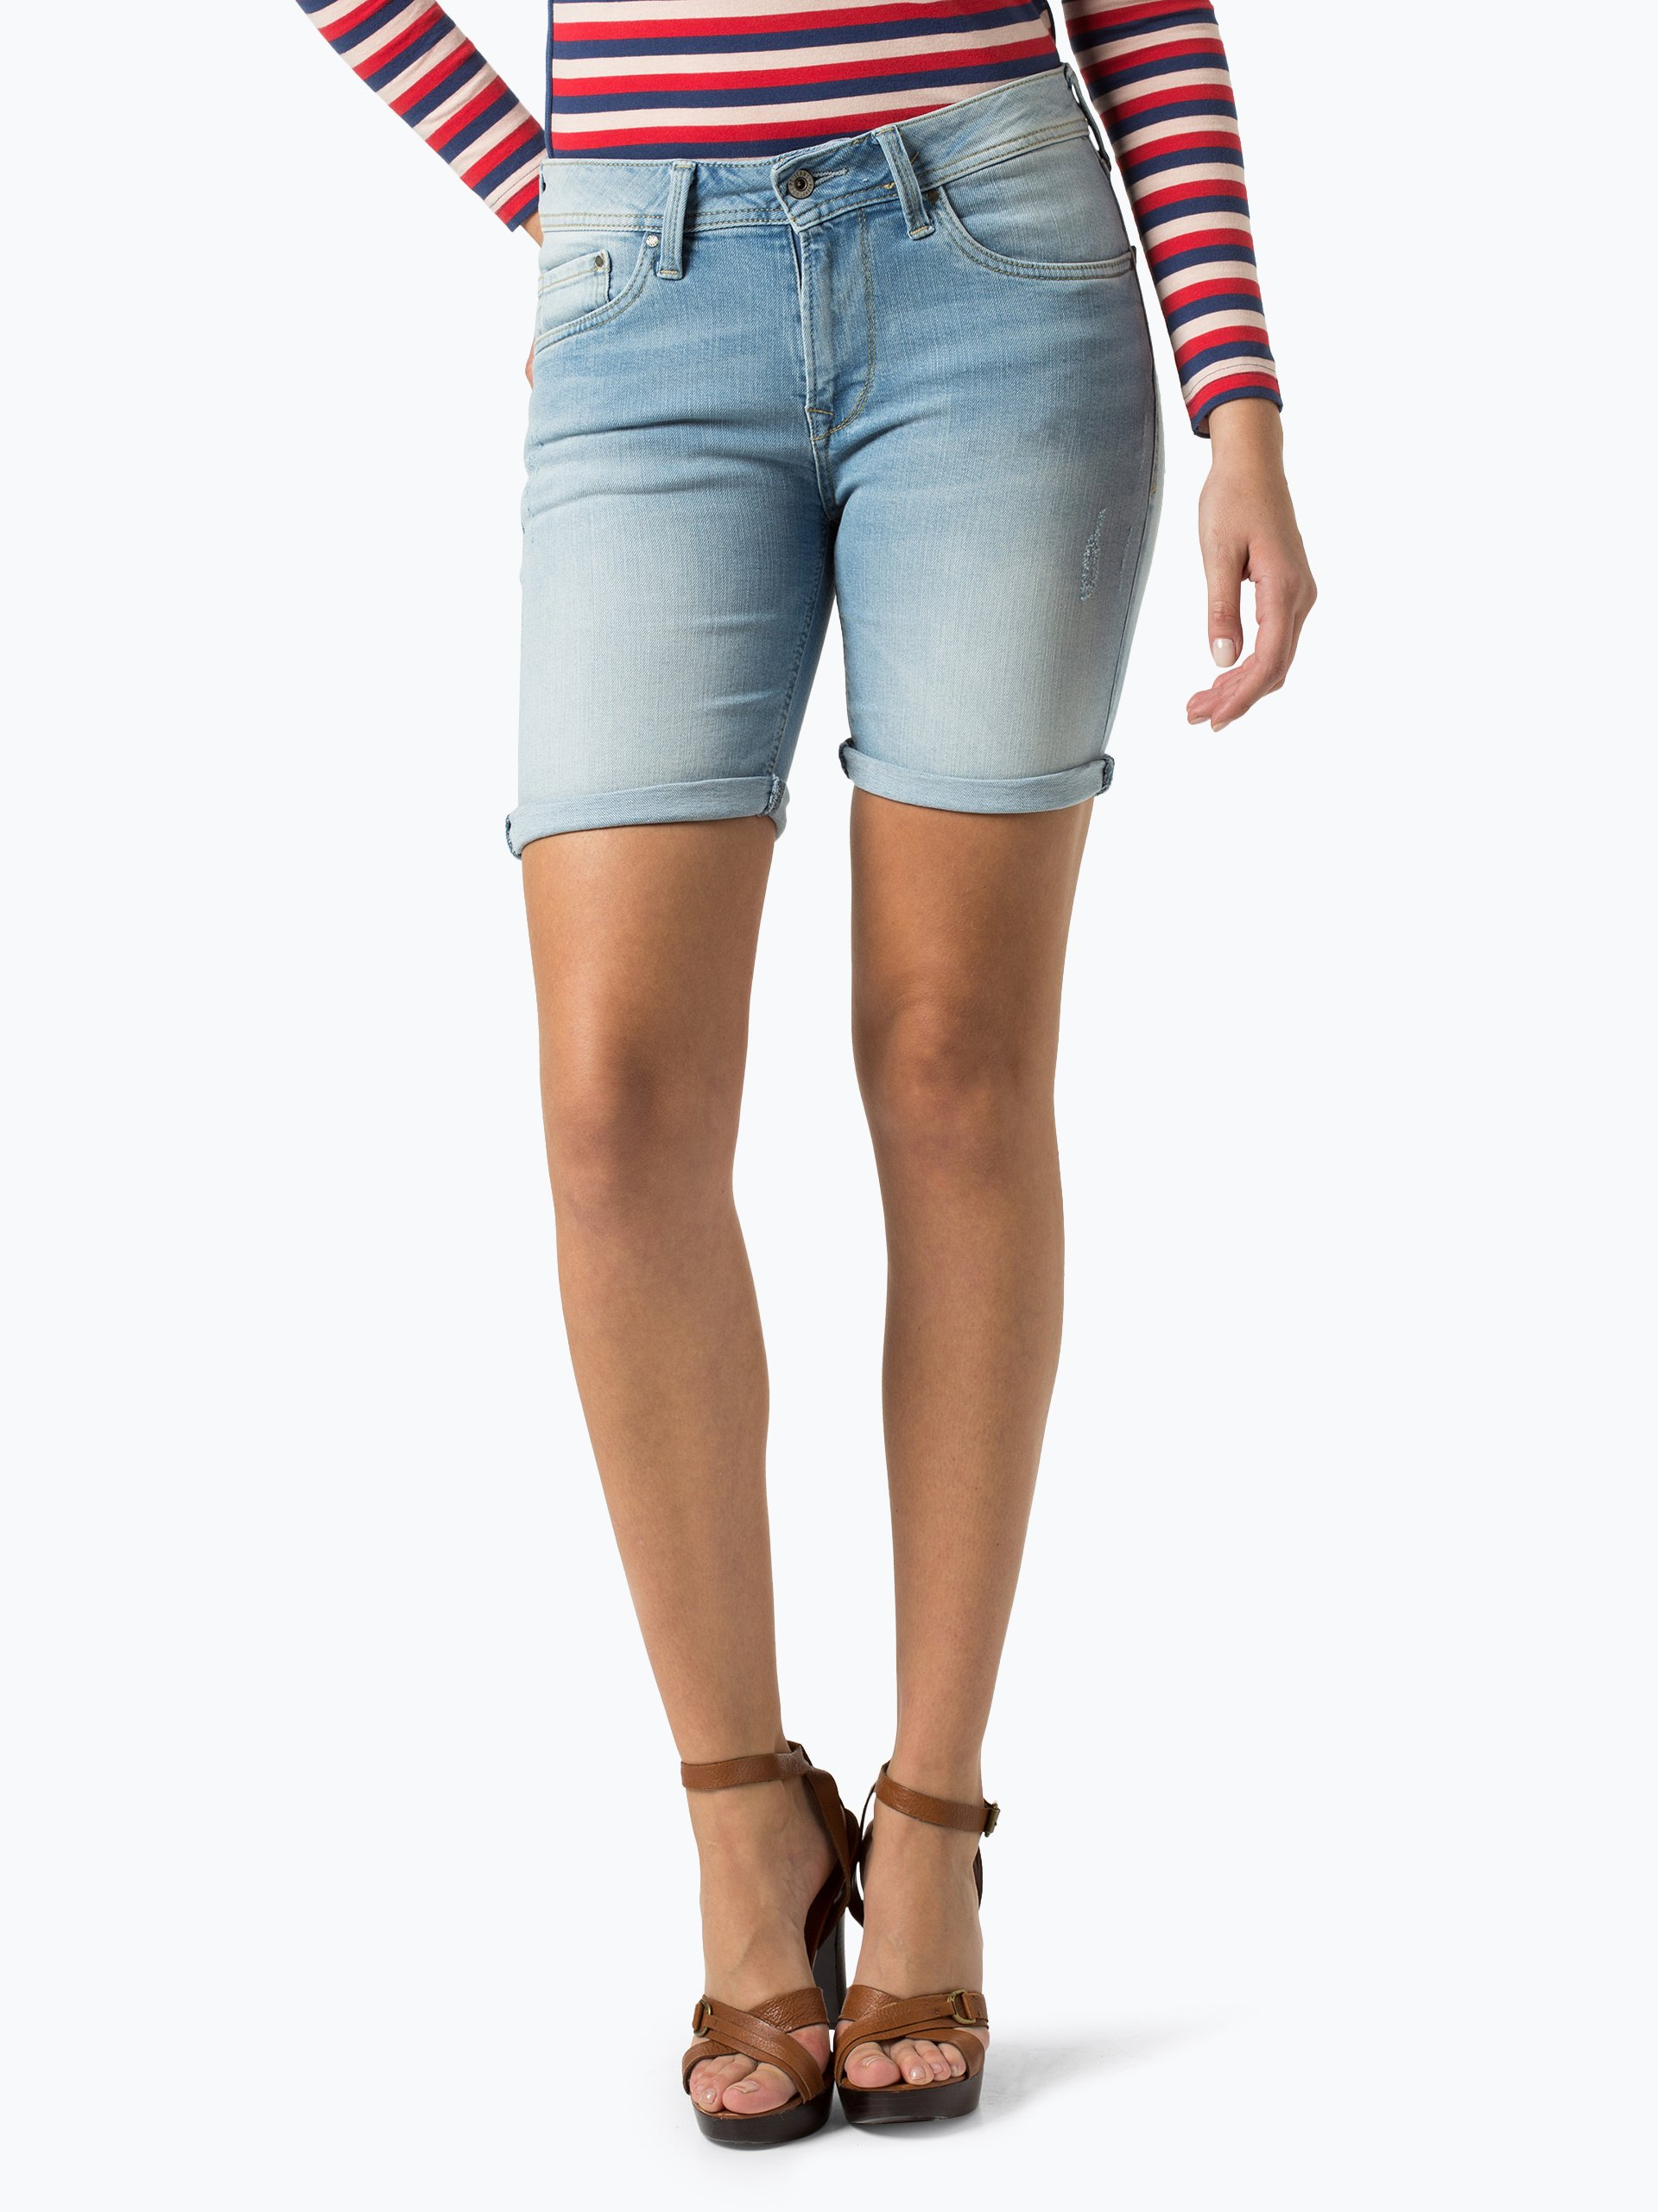 pepe jeans damen jeansshorts poppy 2 online kaufen peek und cloppenburg de. Black Bedroom Furniture Sets. Home Design Ideas